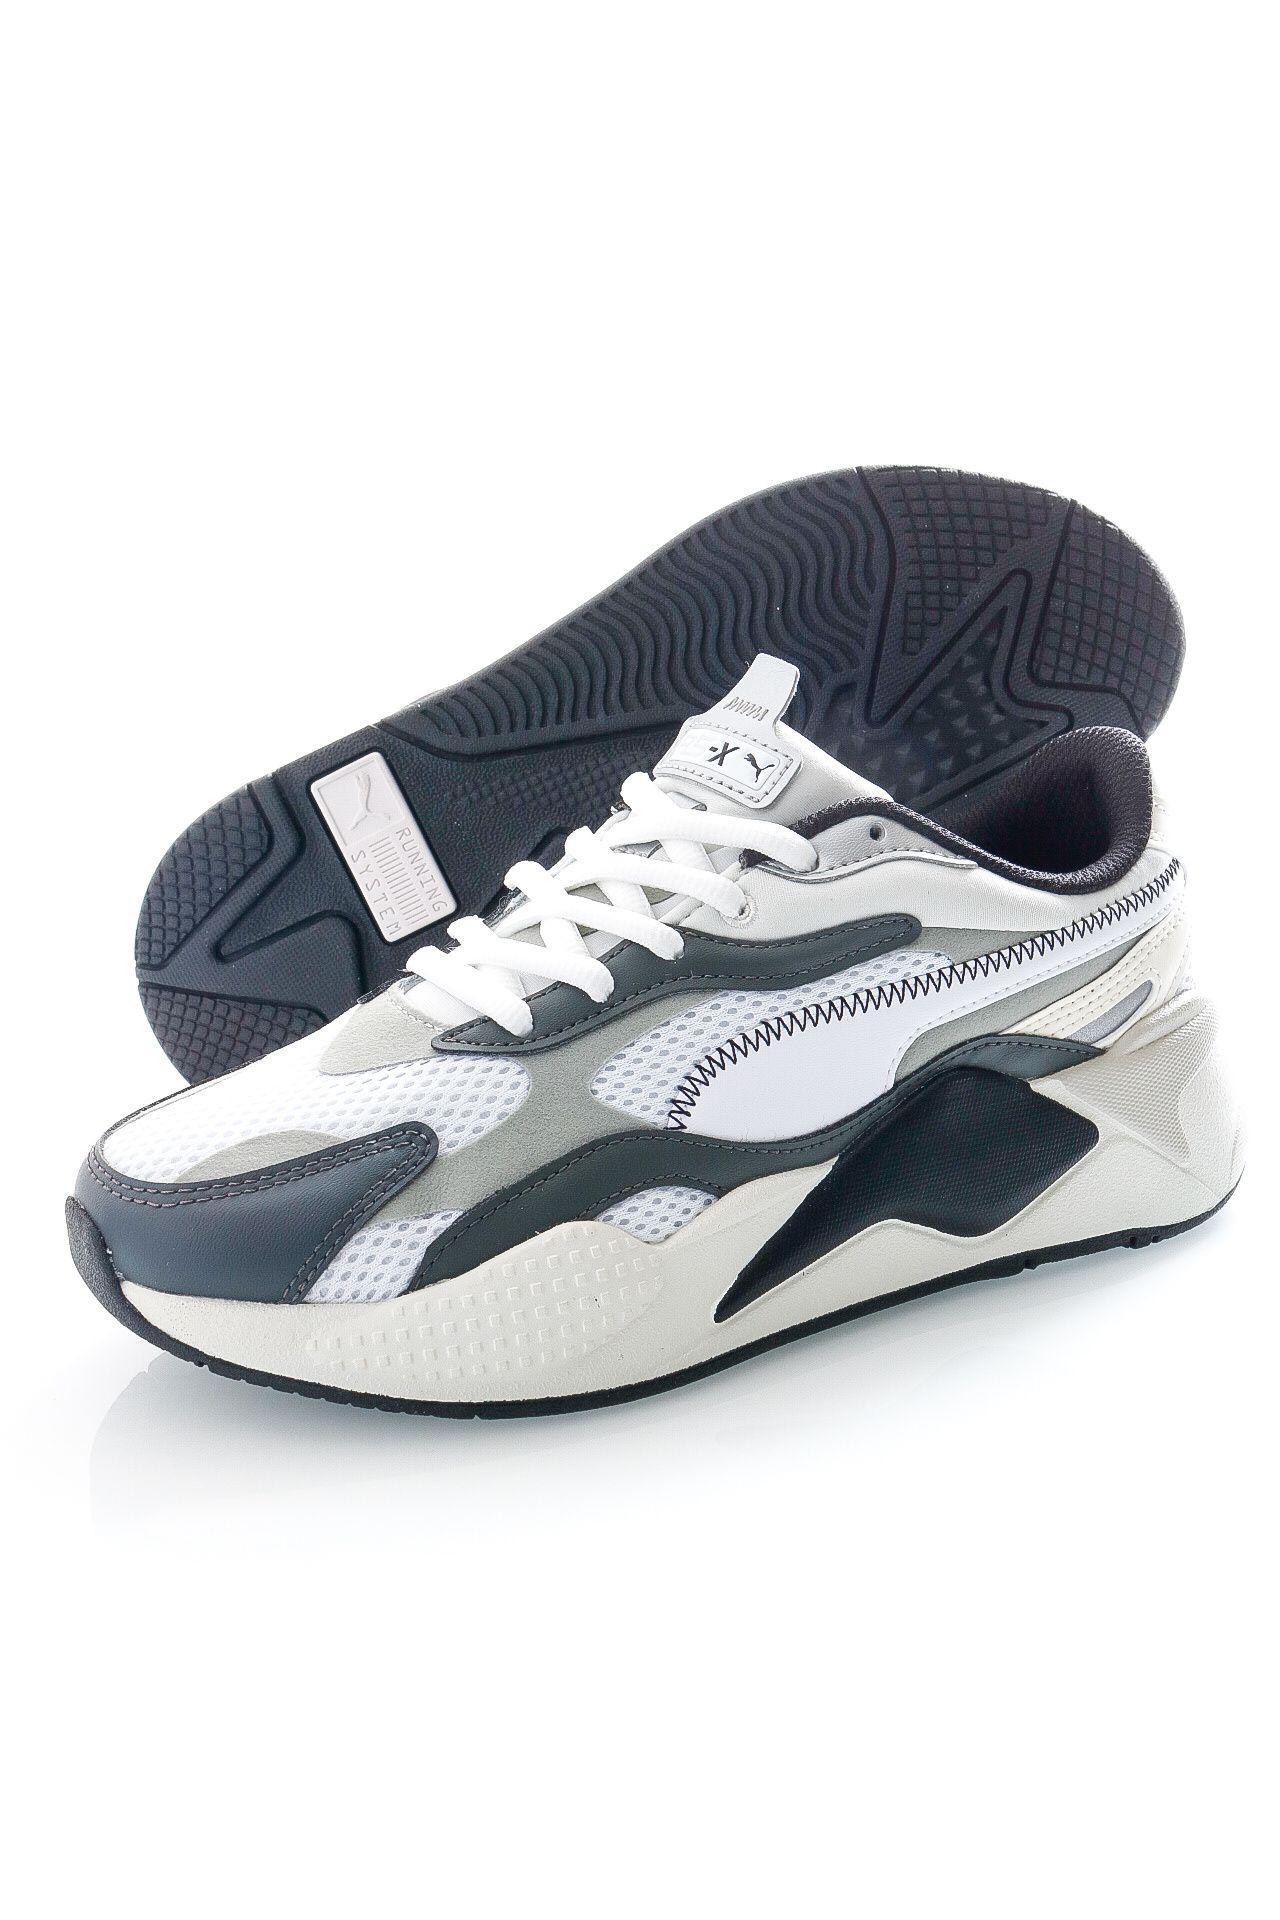 Afbeelding van Puma Sneakers RS-X³ Millenium Puma White-Puma Black-Limestone 37323